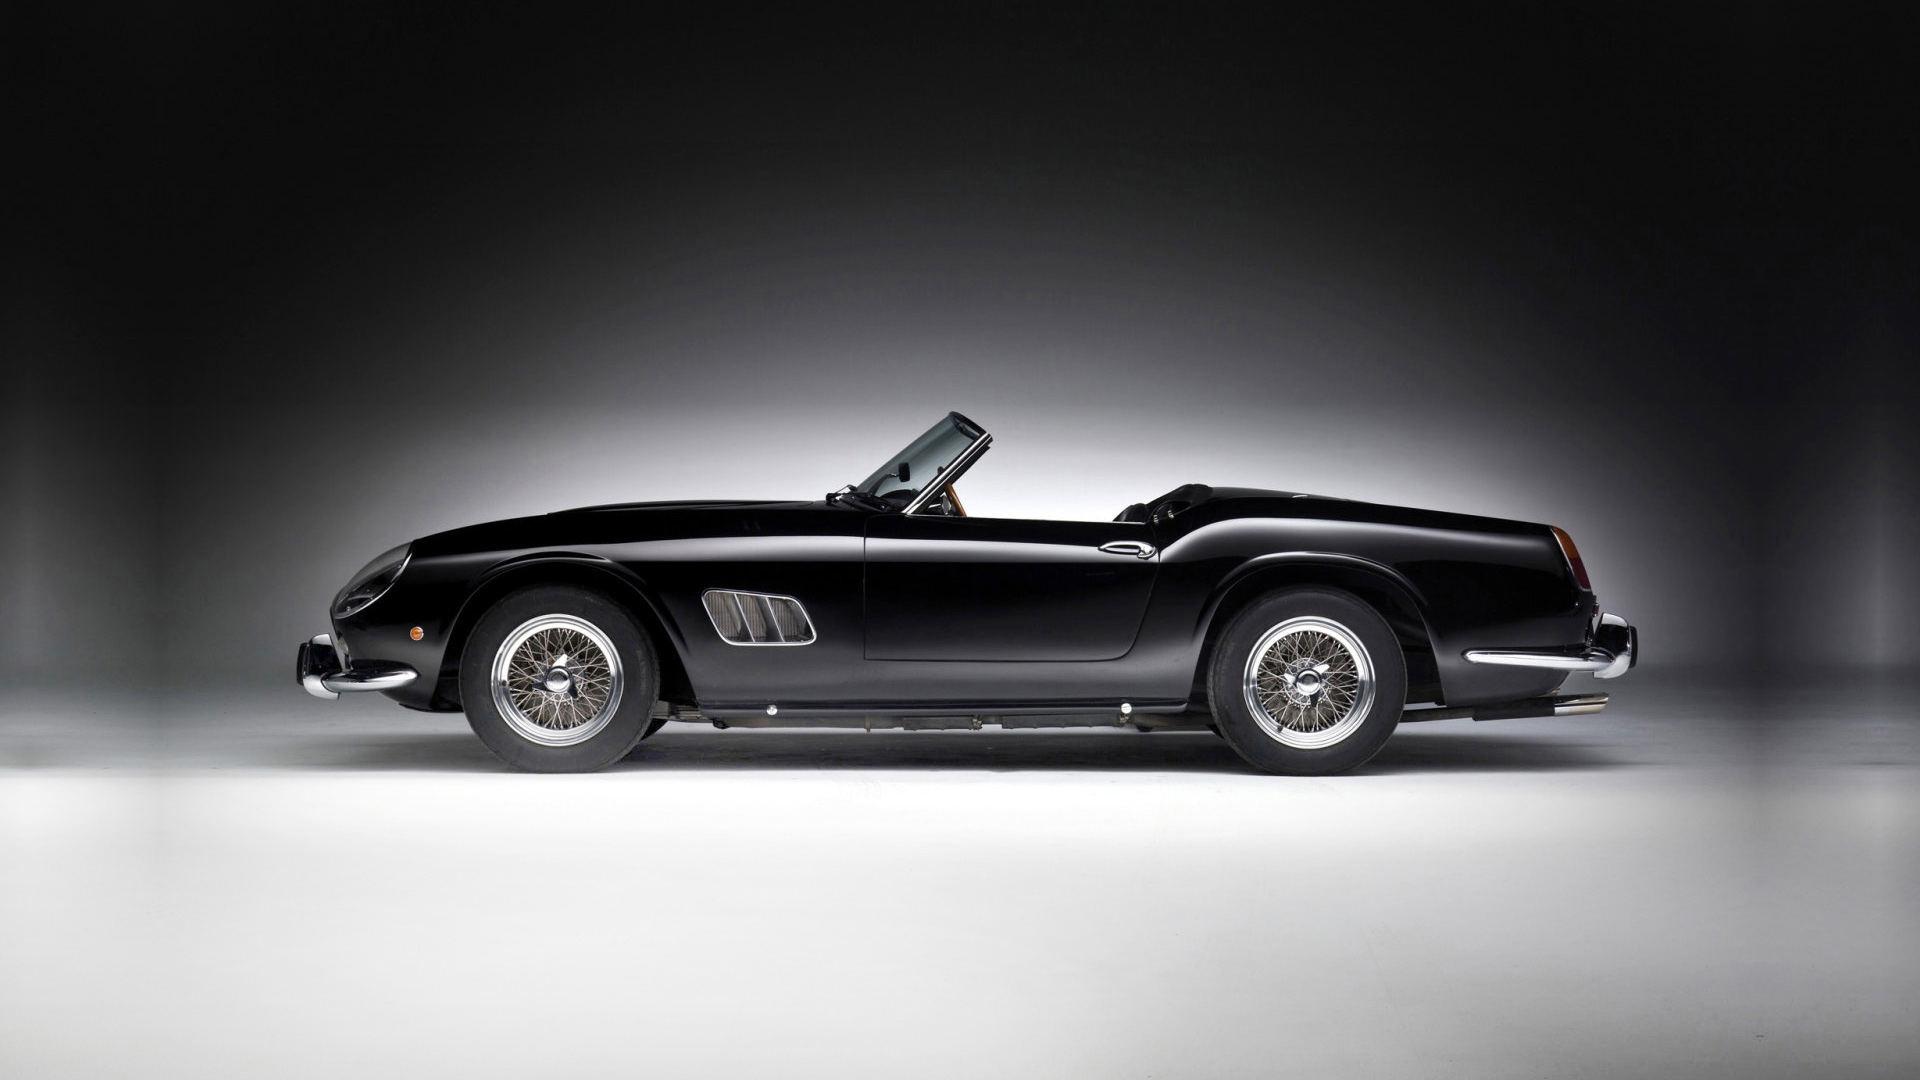 1963 Ferrari 250 GT California Spyder